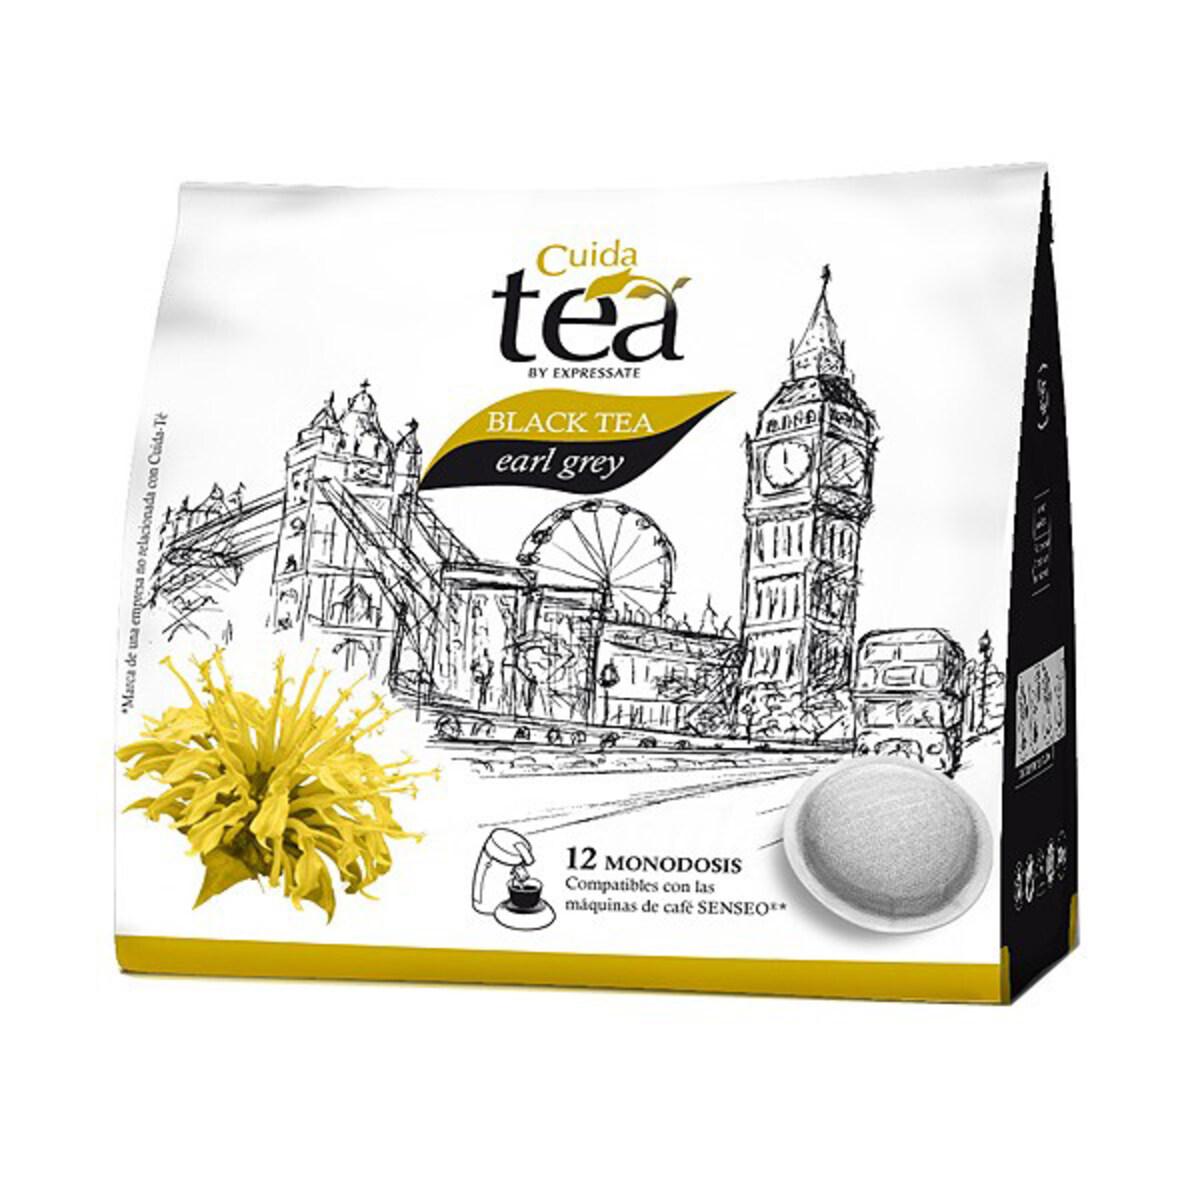 Cuida Black Tea Earl Grey - Сенсео съвместим пад черен чай